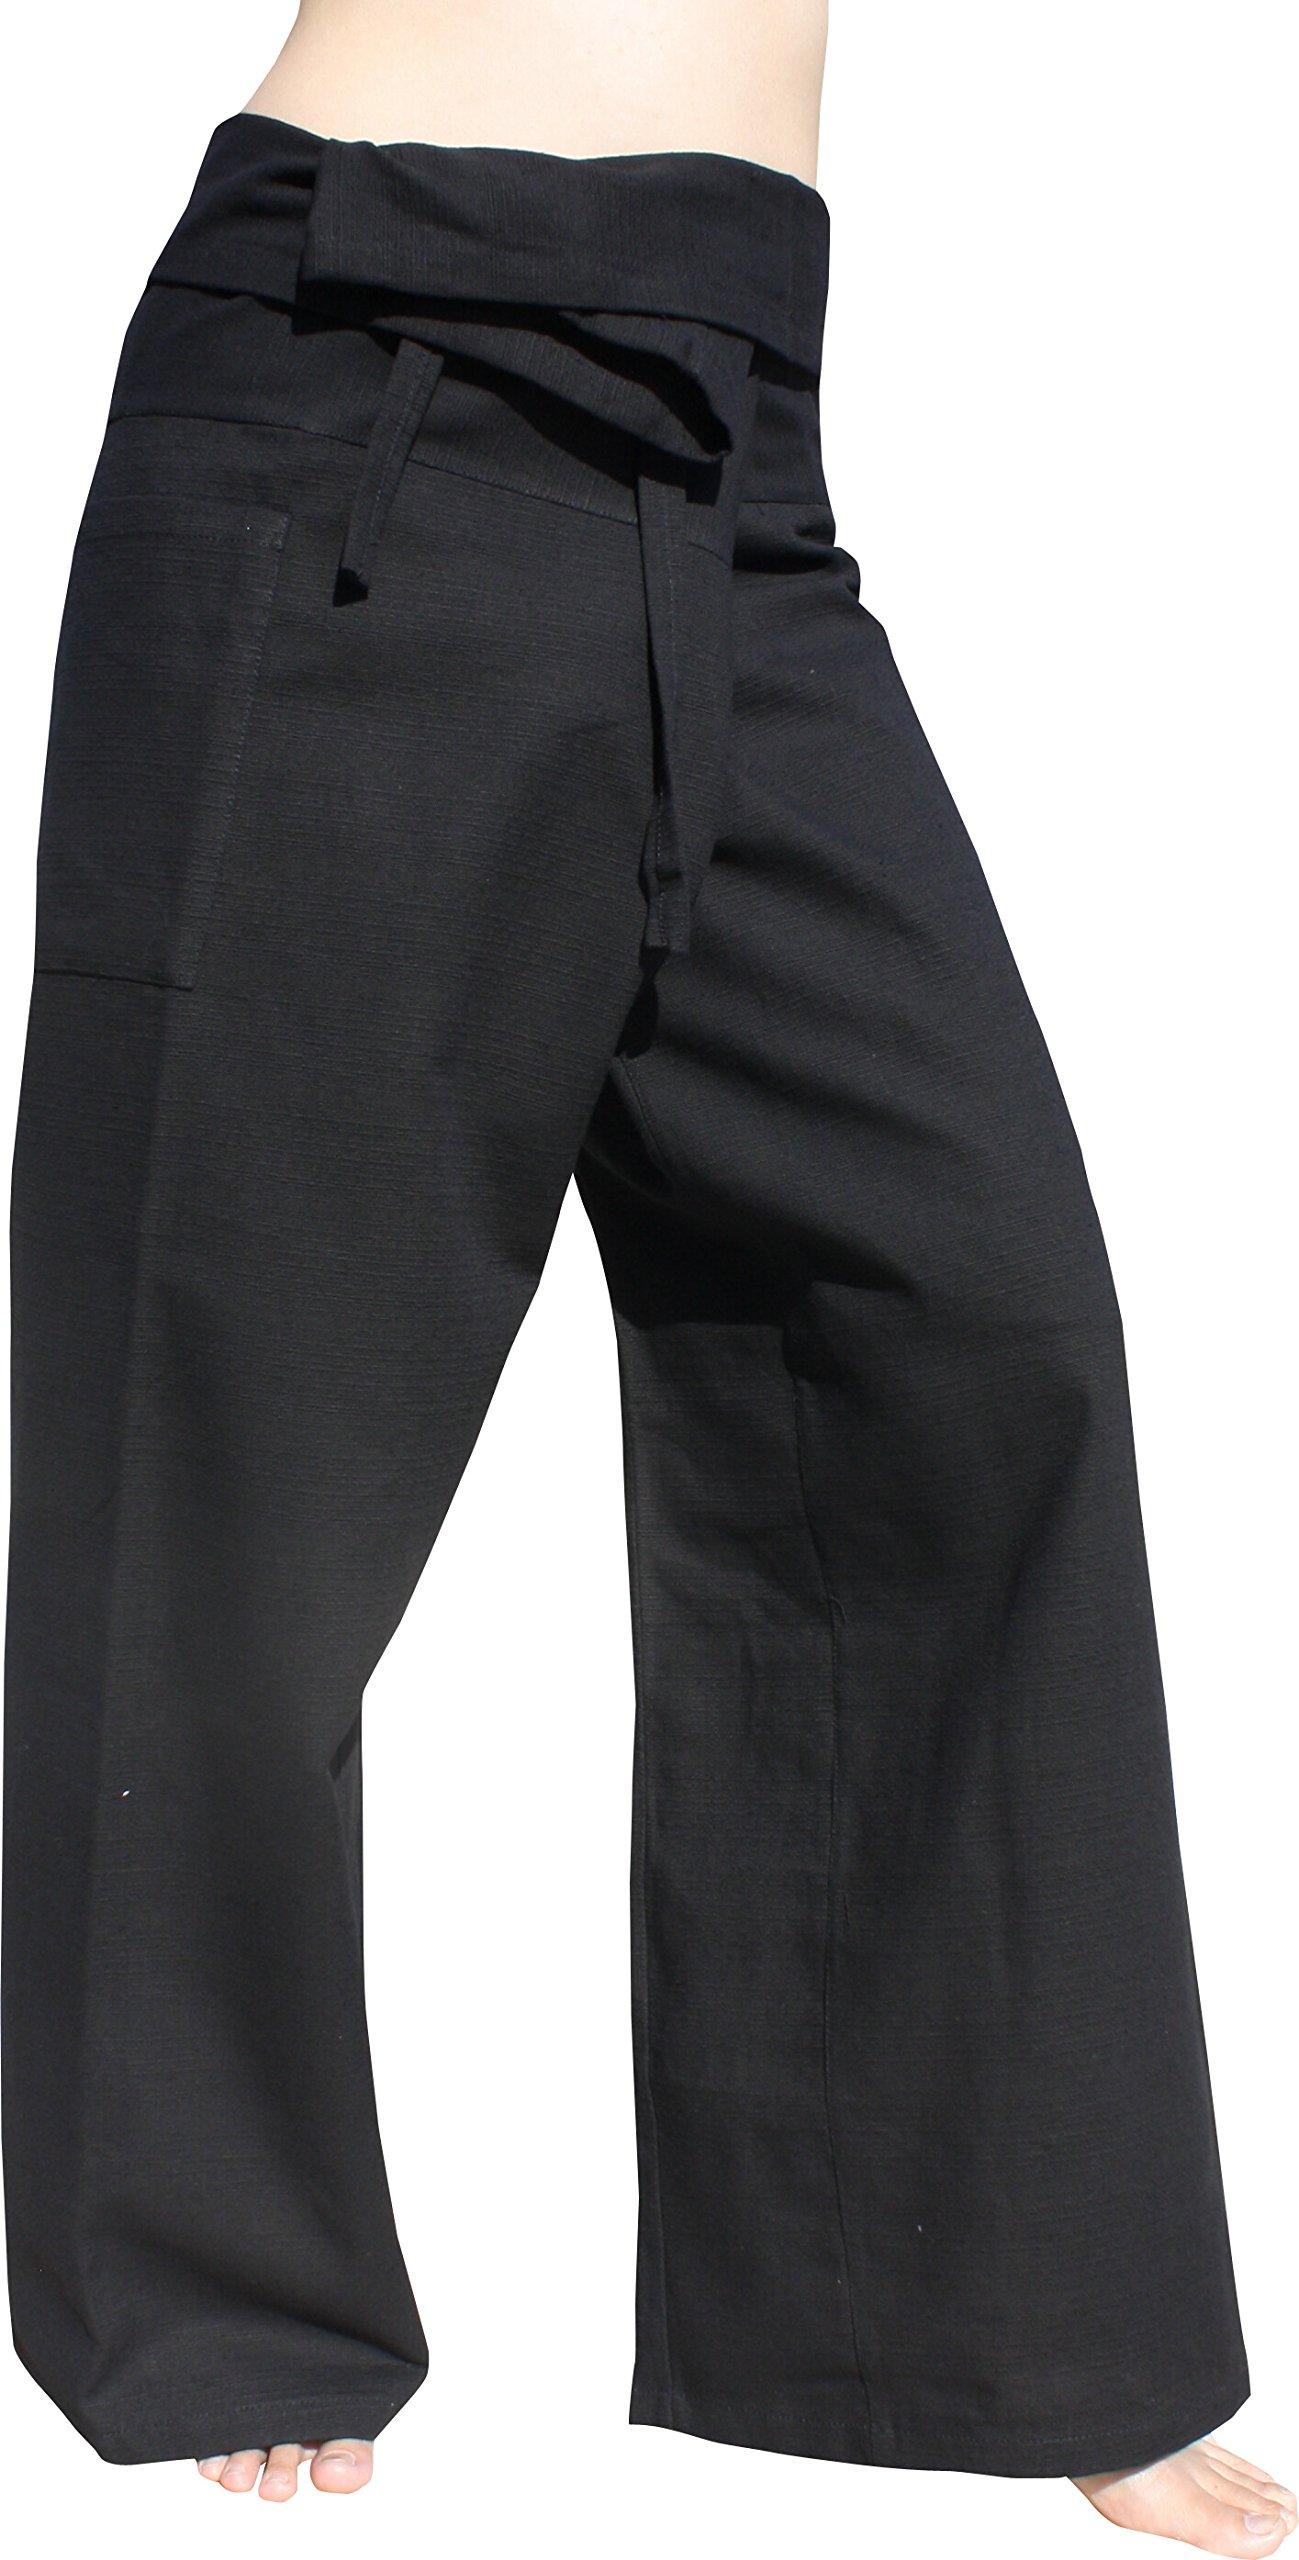 Raan Pah Muang Brand Plain Thick Line Cotton Thai Fisherman Wrap Tall Length Pants, Small, Black by Raan Pah Muang